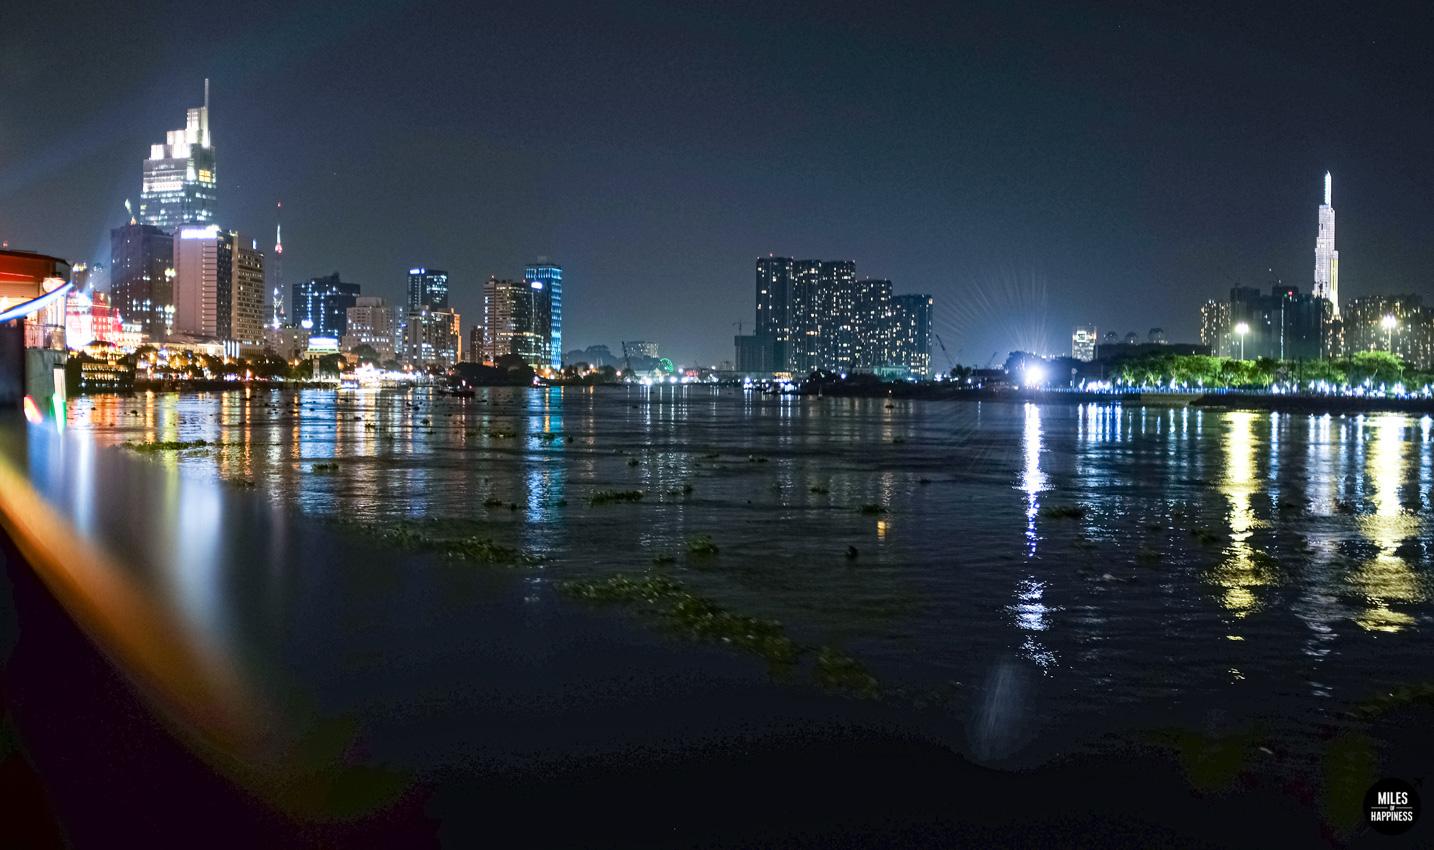 An evening on Saigon River - With Bonsai Cruise